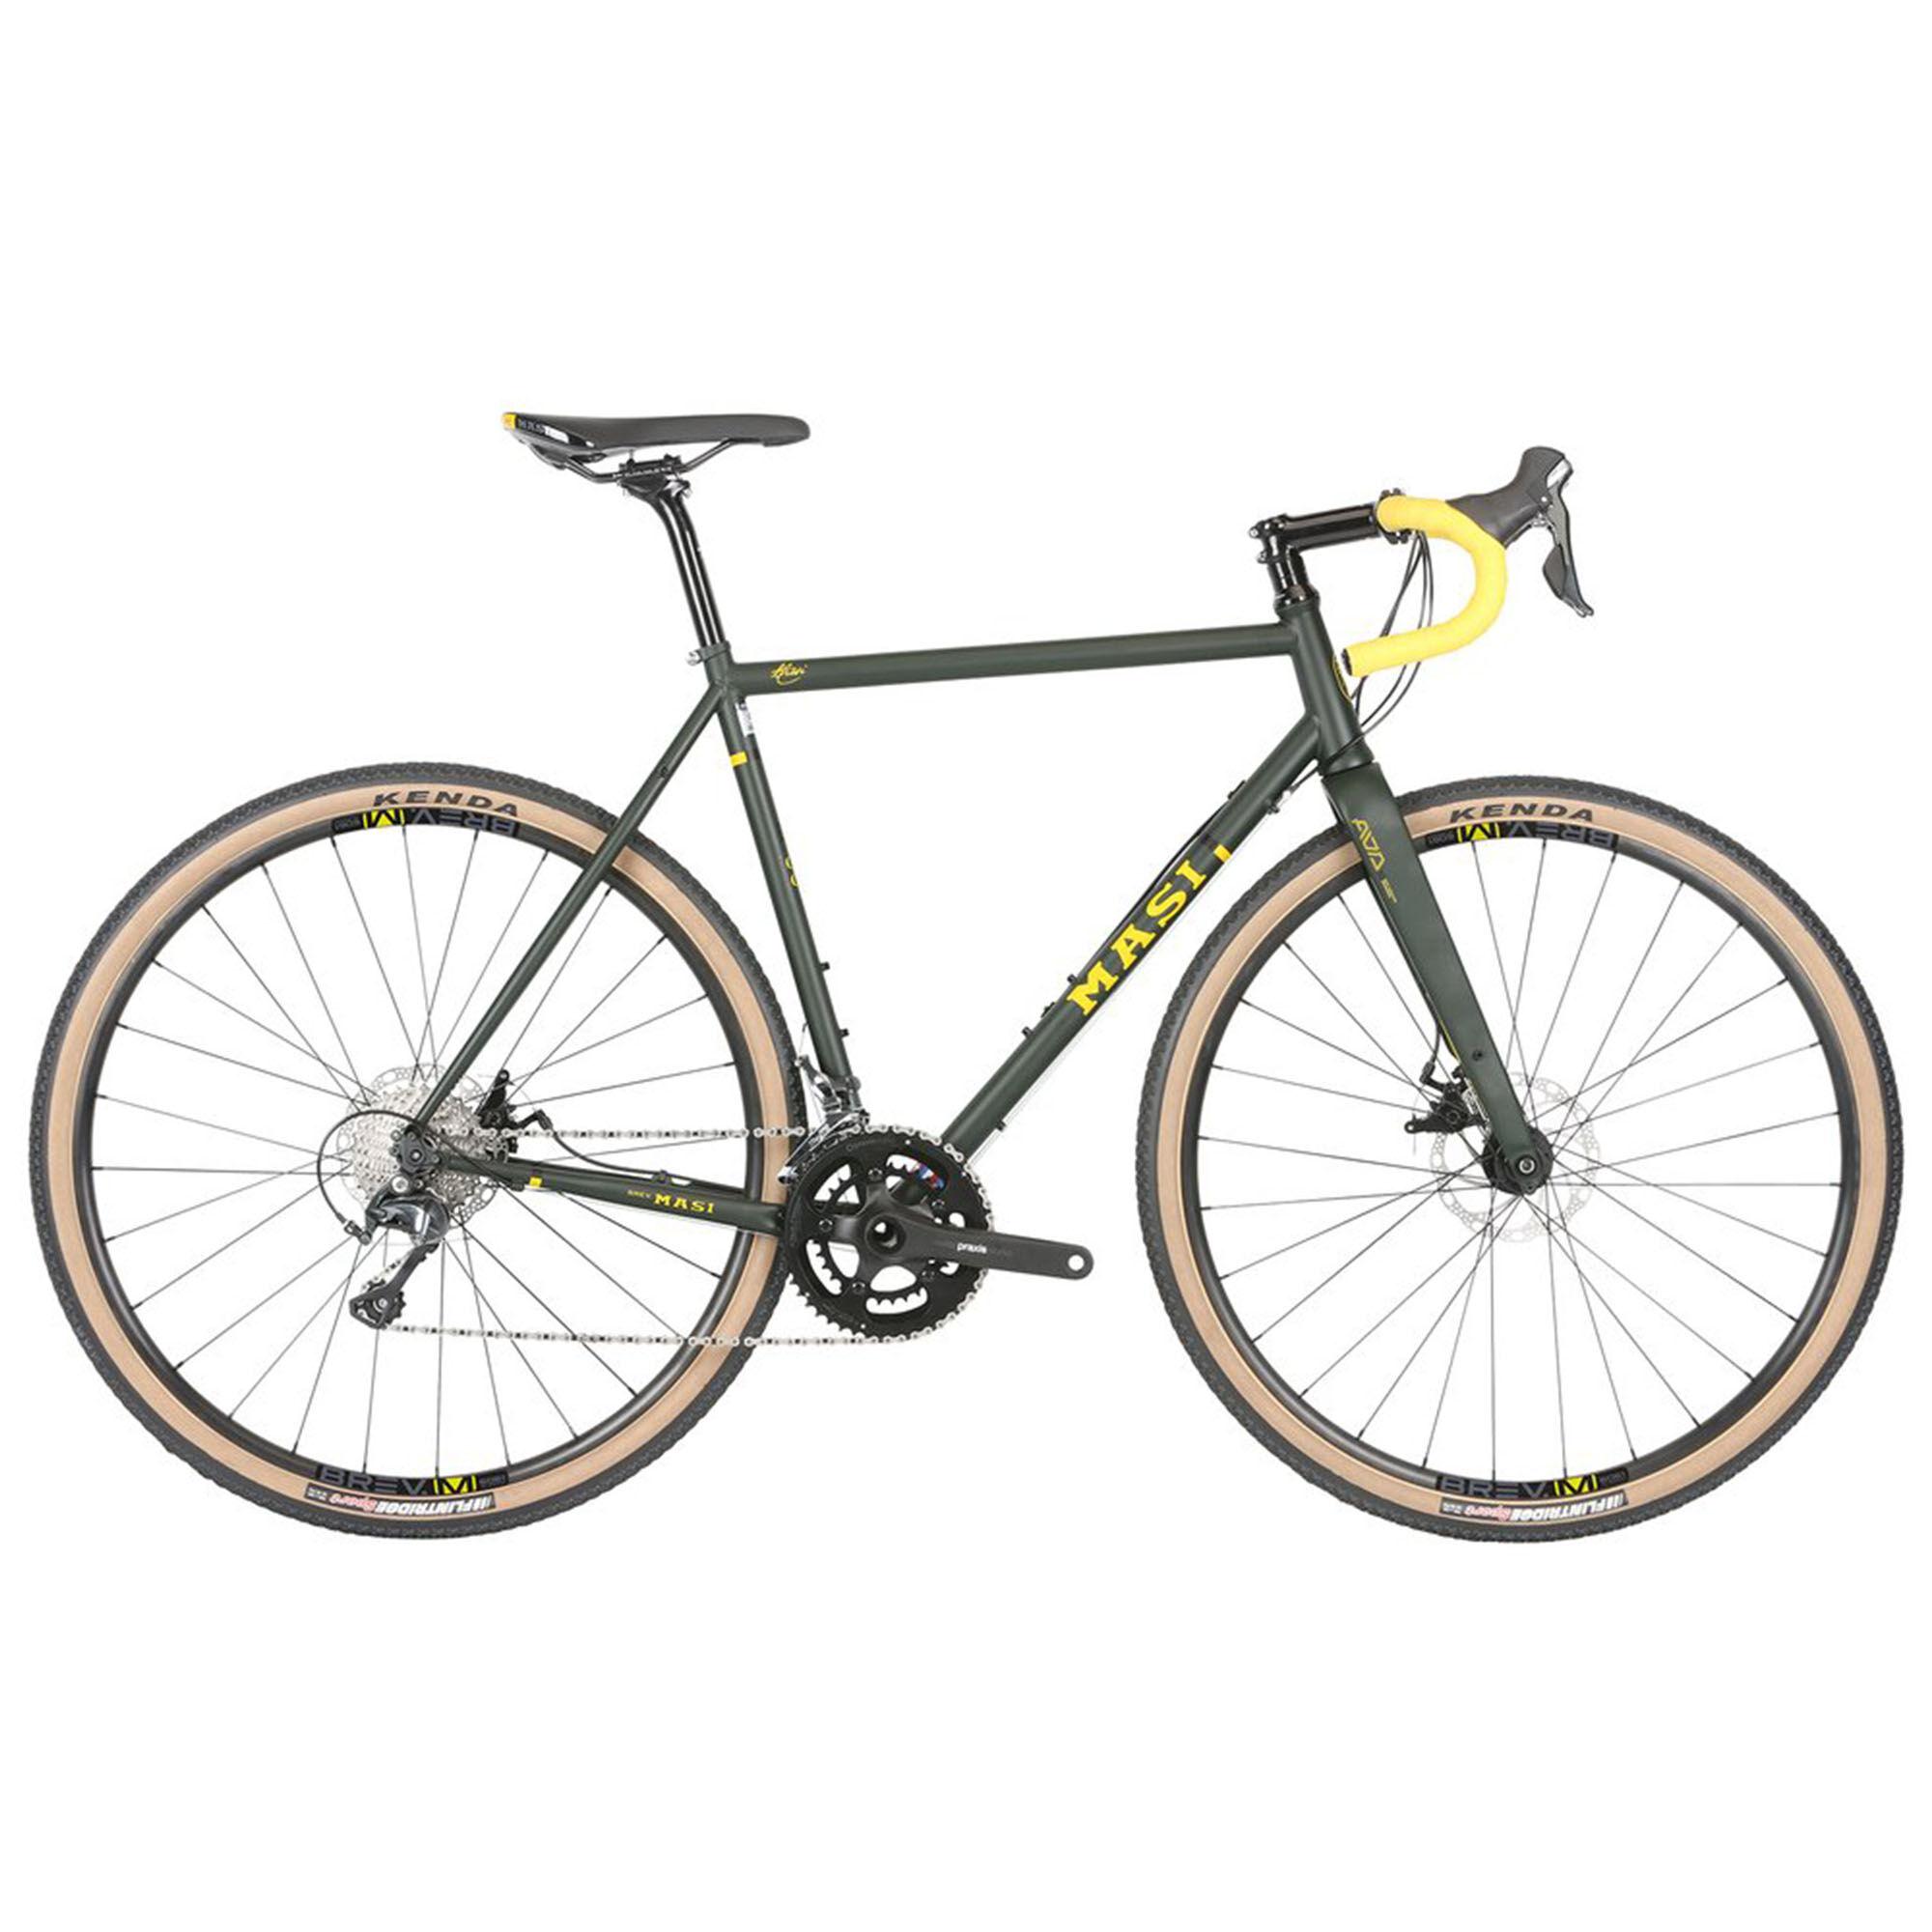 Masi CXGR Expert Gravel Bike '20  - Green - Size: 53